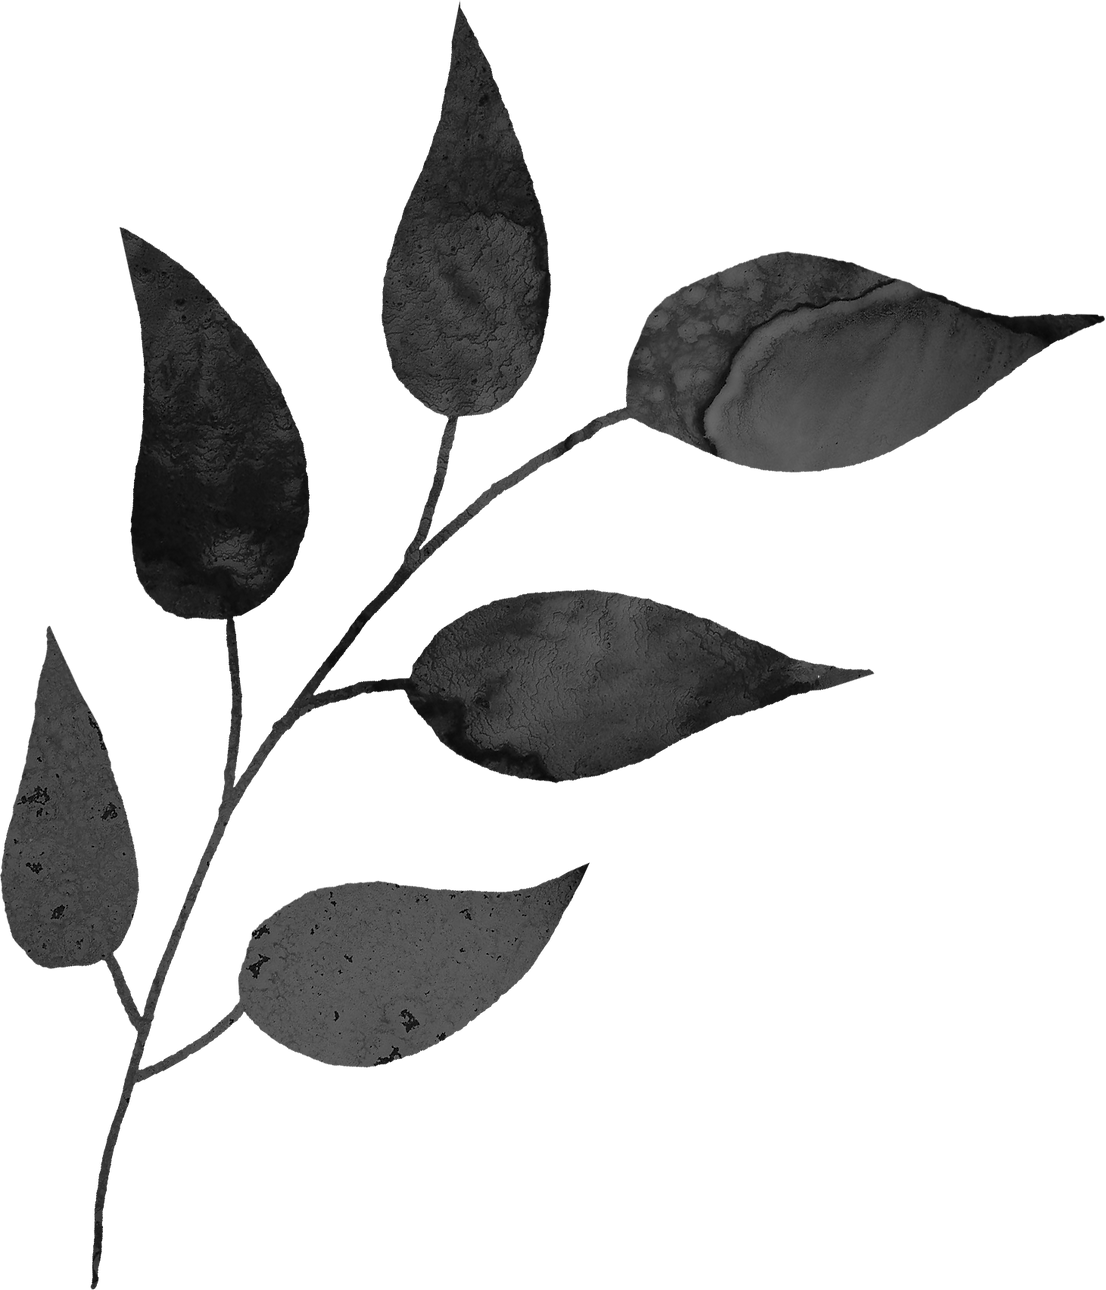 floral_0026_m.png